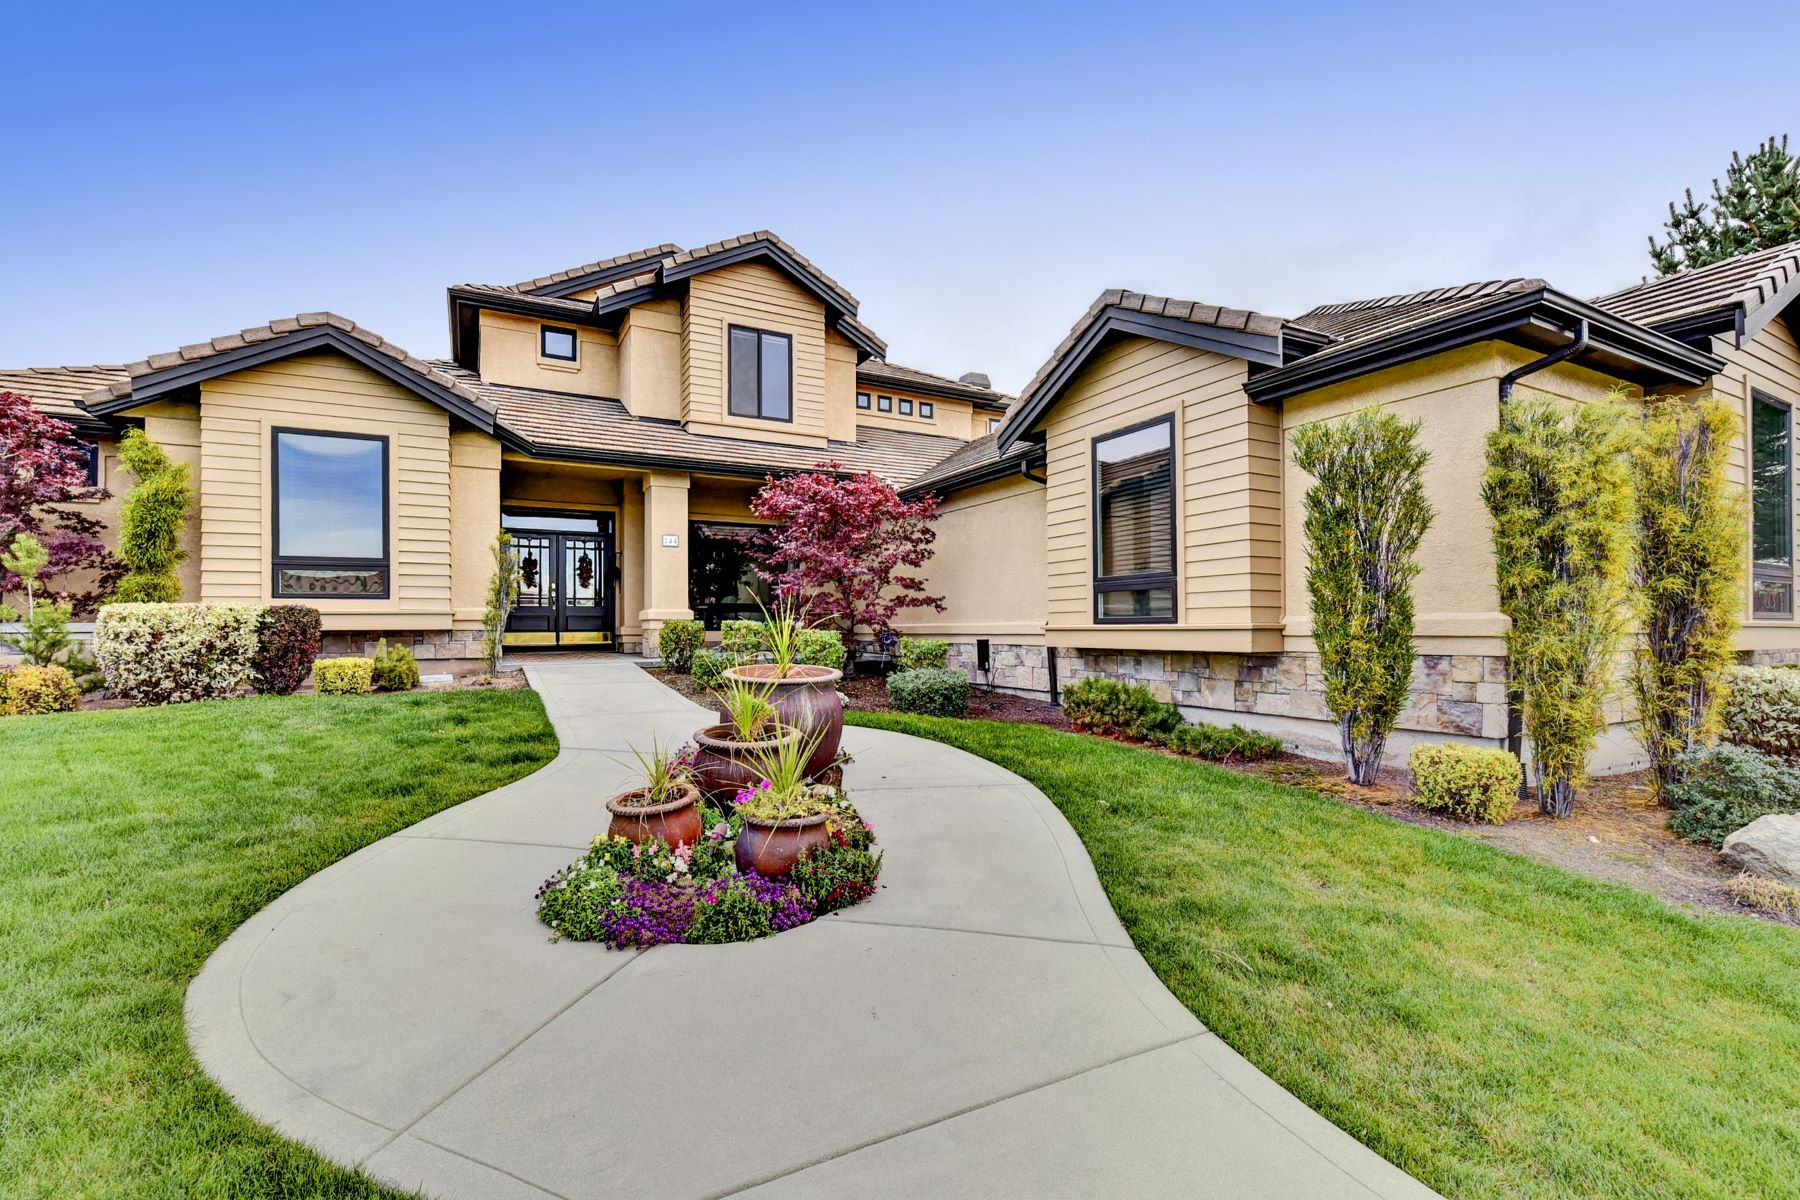 Casa Unifamiliar por un Venta en 244 Al Fresco, Boise 244 N Al Fresco Boise, Idaho, 83712 Estados Unidos